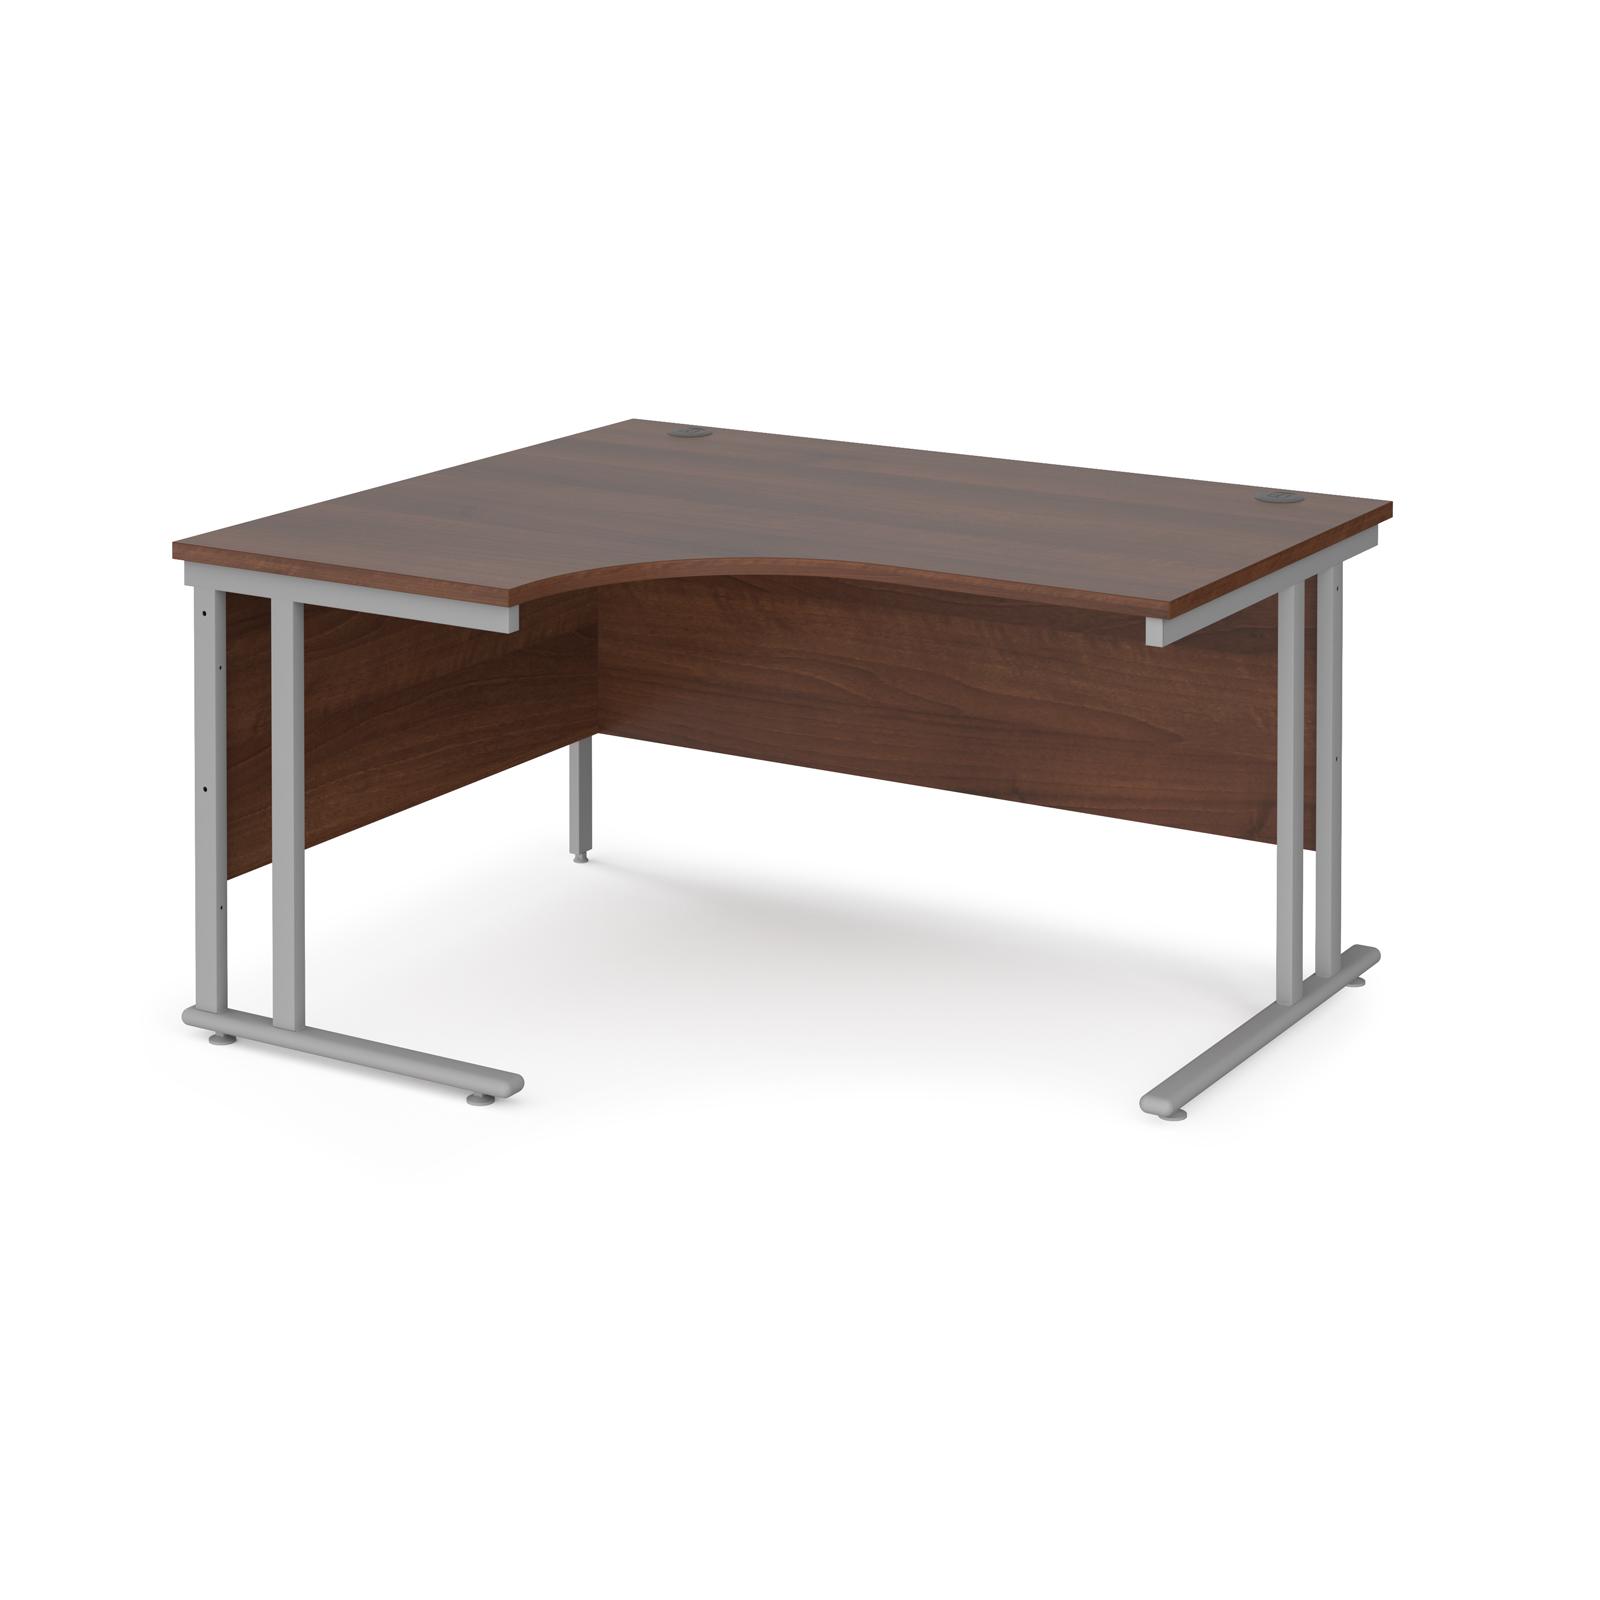 Left Handed Maestro 25 left hand ergonomic desk 1400mm wide - silver cantilever leg frame, walnut top